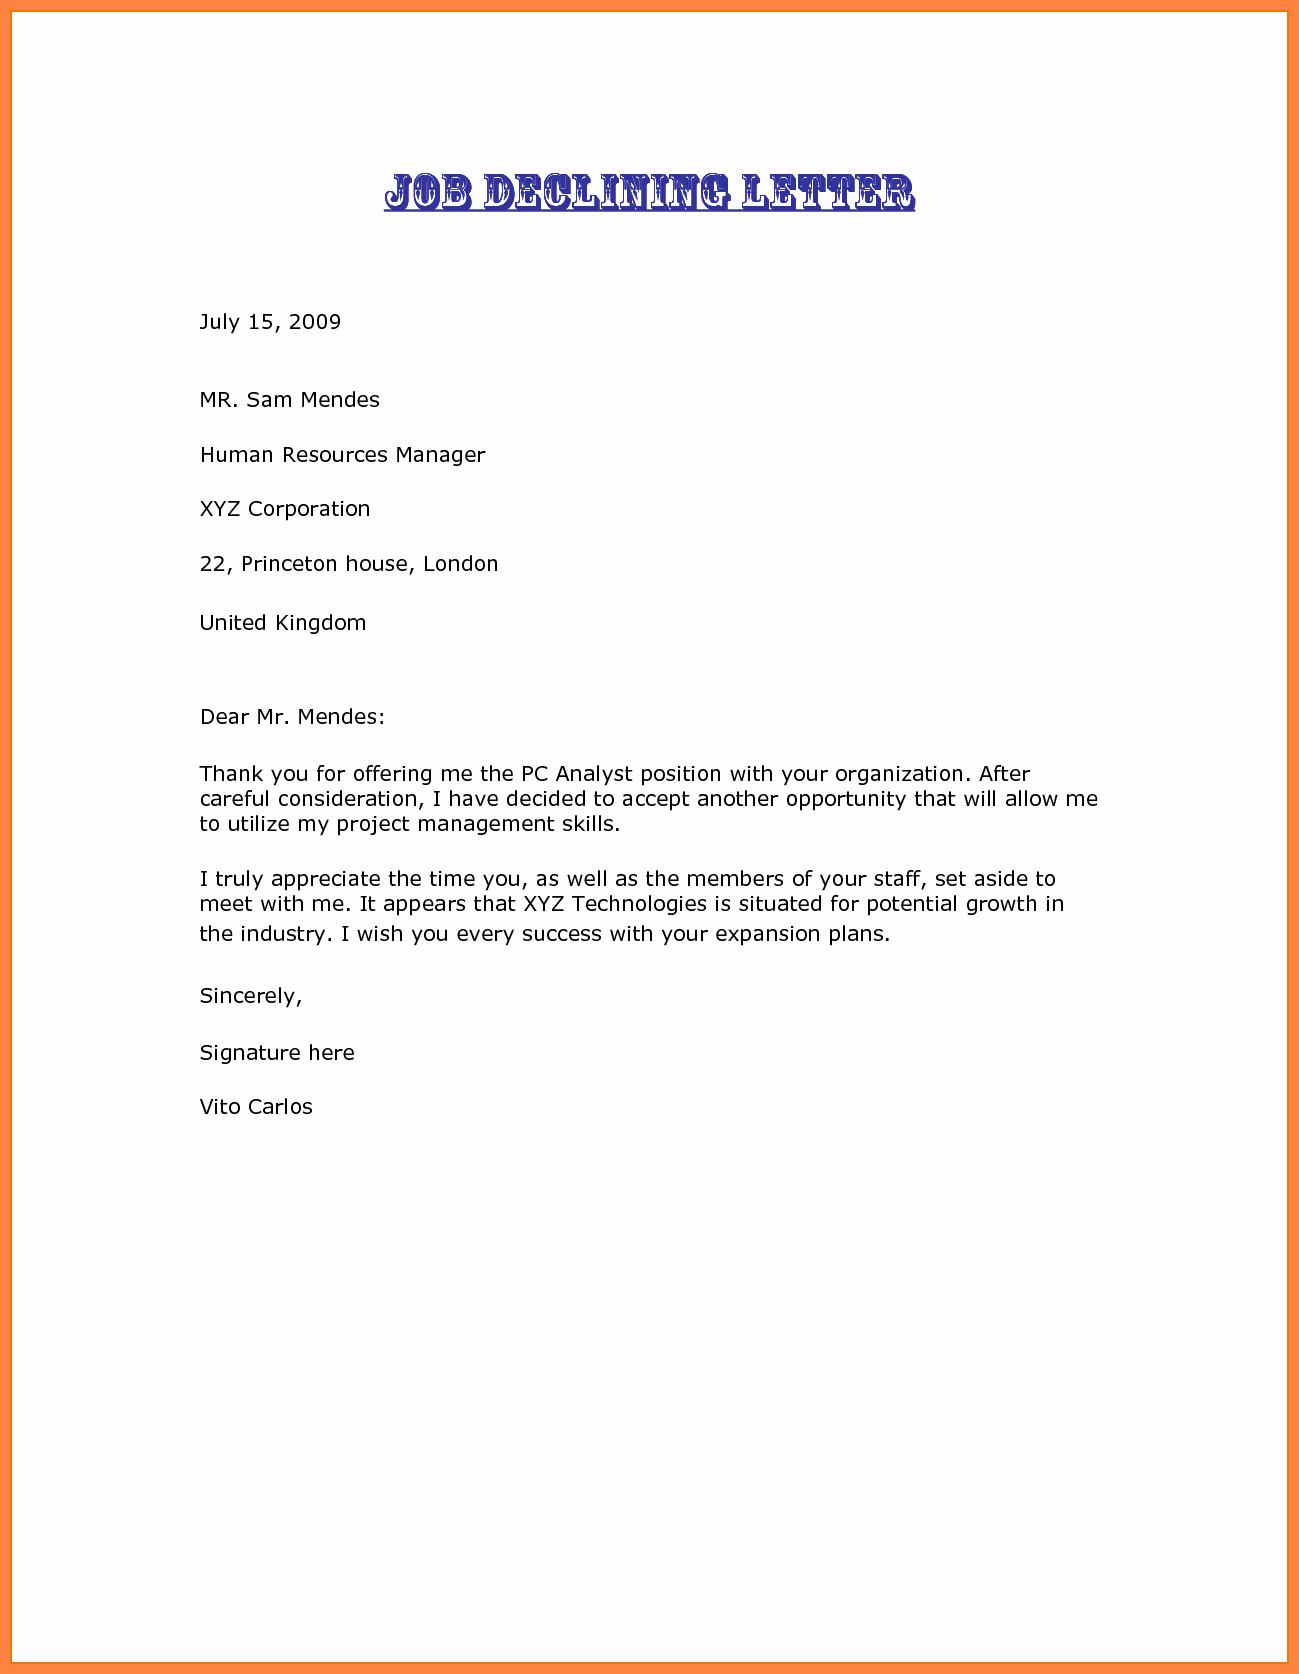 Decline to Bid Letter Fresh 3 Decline A Job Offer